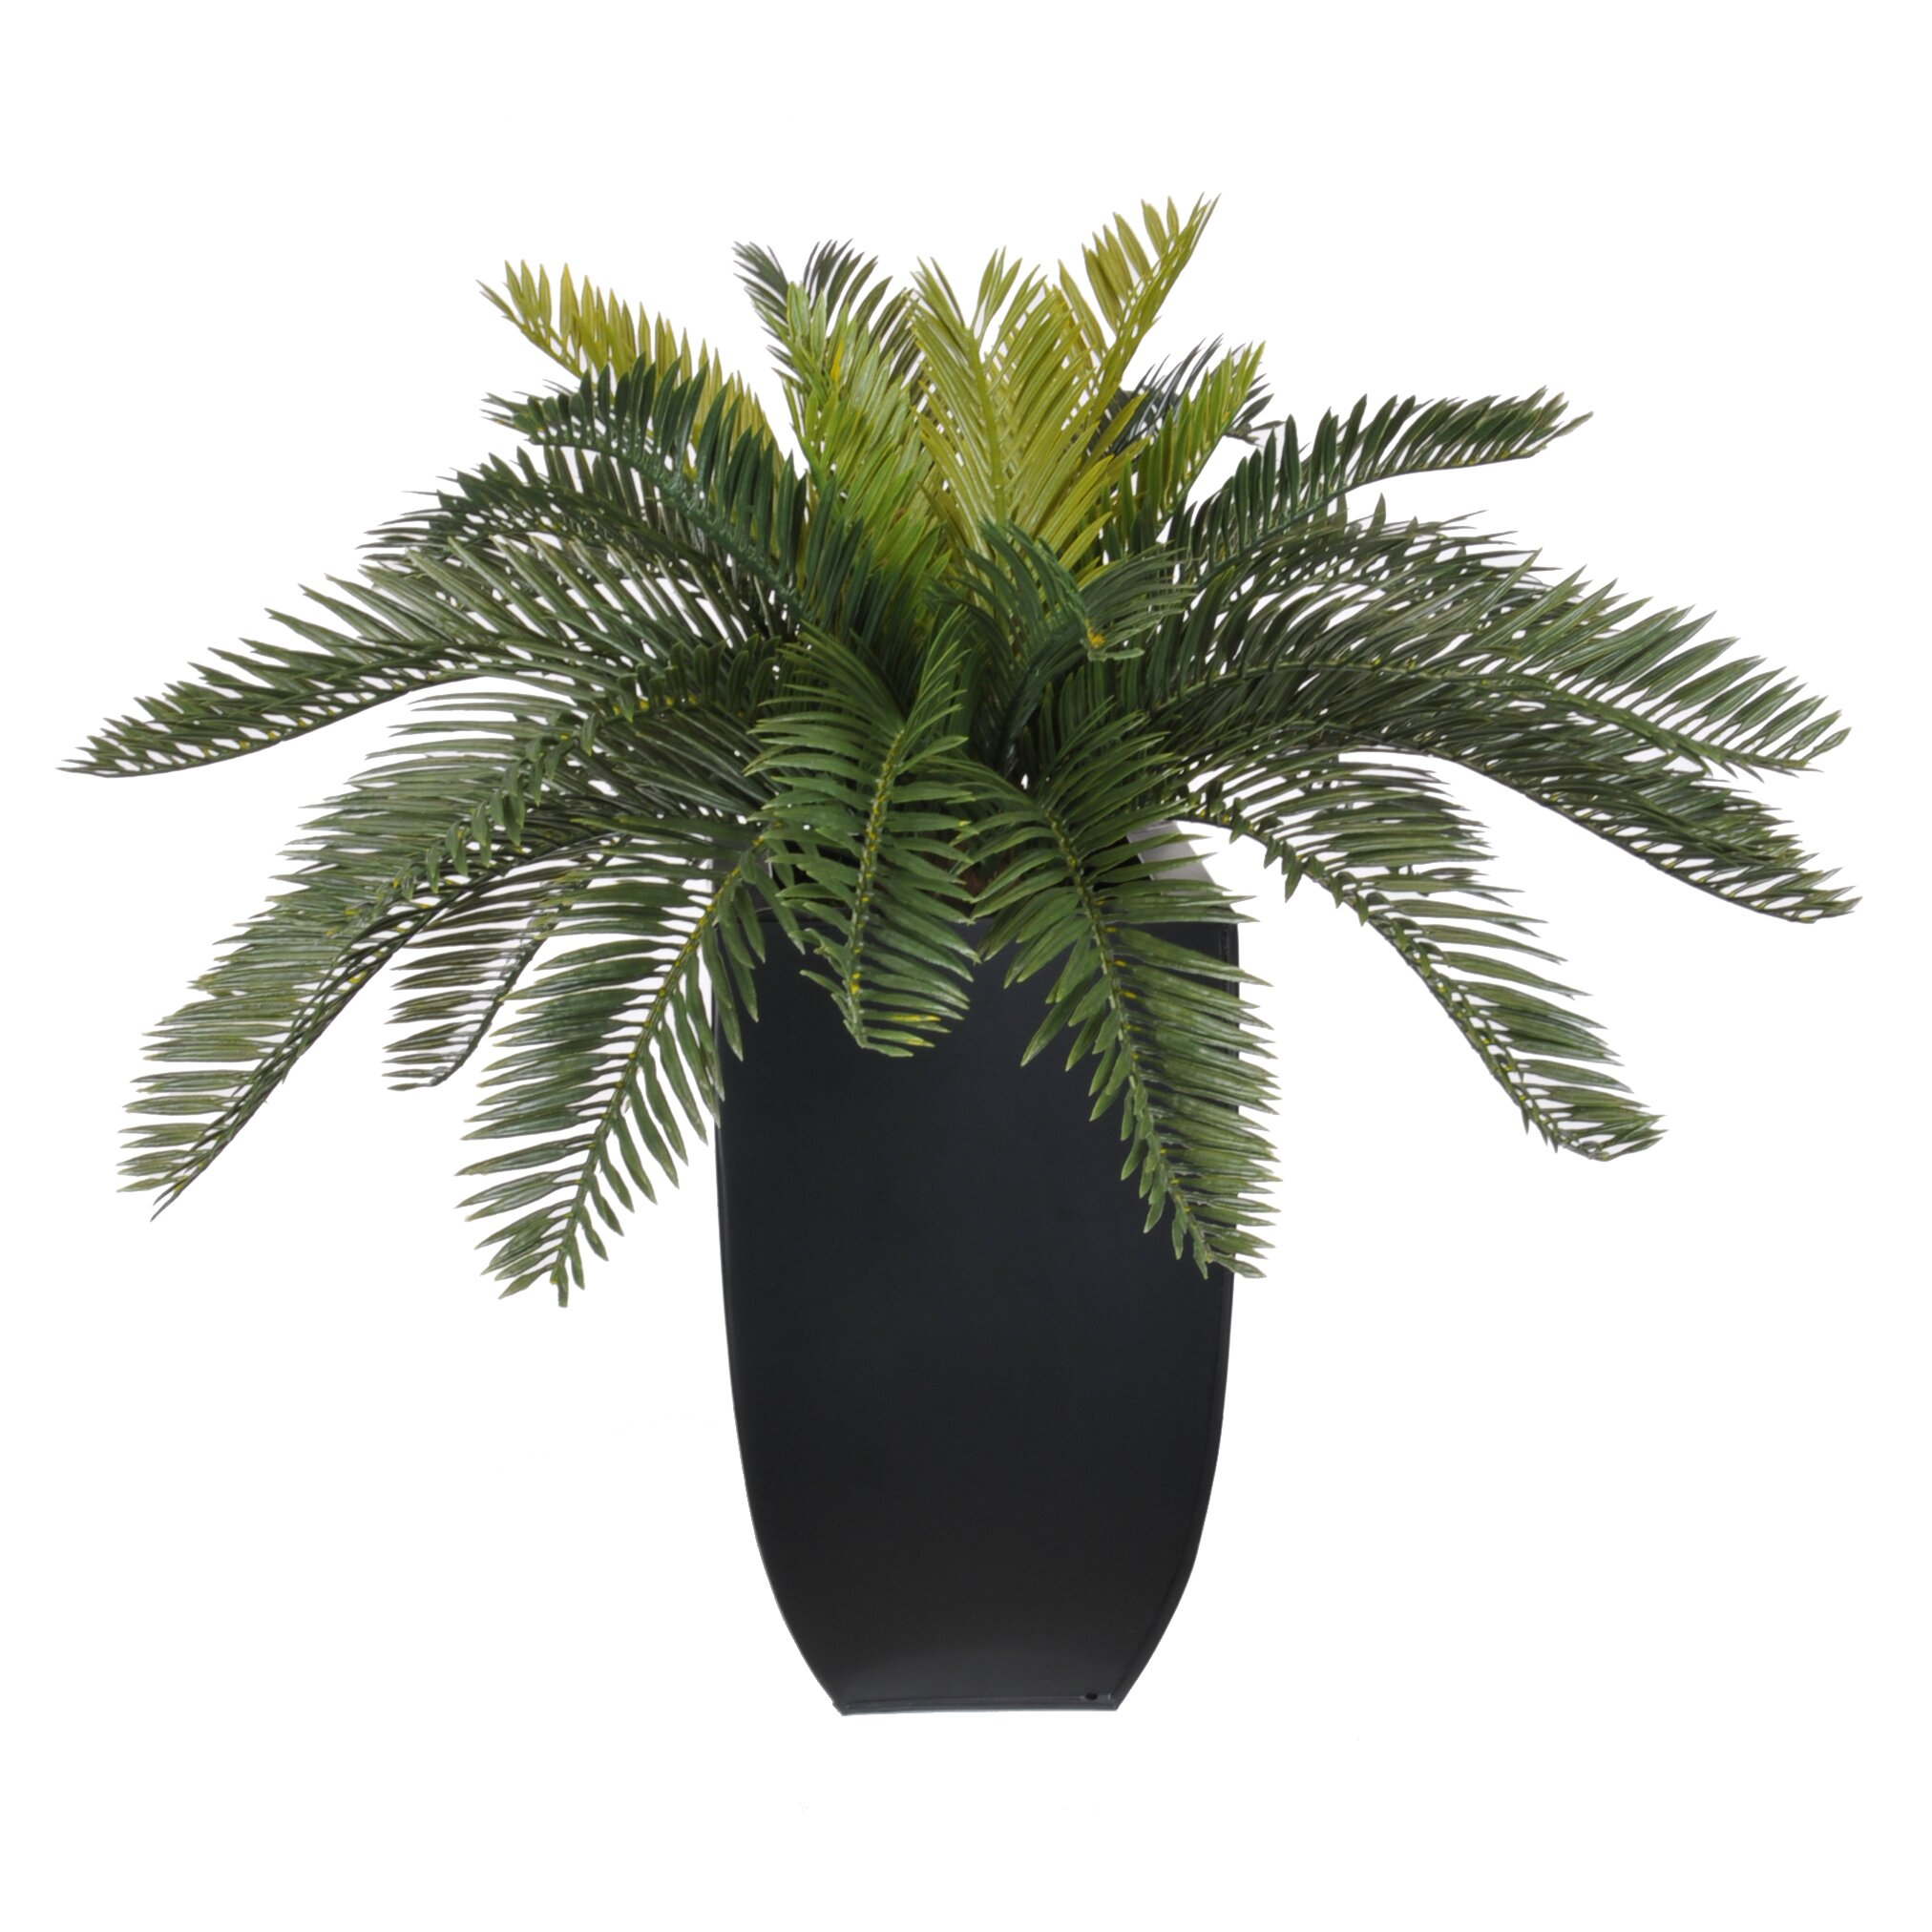 House of Silk Flowers Artificial Cycas Palm Floor Plant in  : Artificial Cycas Palm Floor Plant in Planter HF0338 BLK from www.wayfair.com size 2024 x 2024 jpeg 499kB